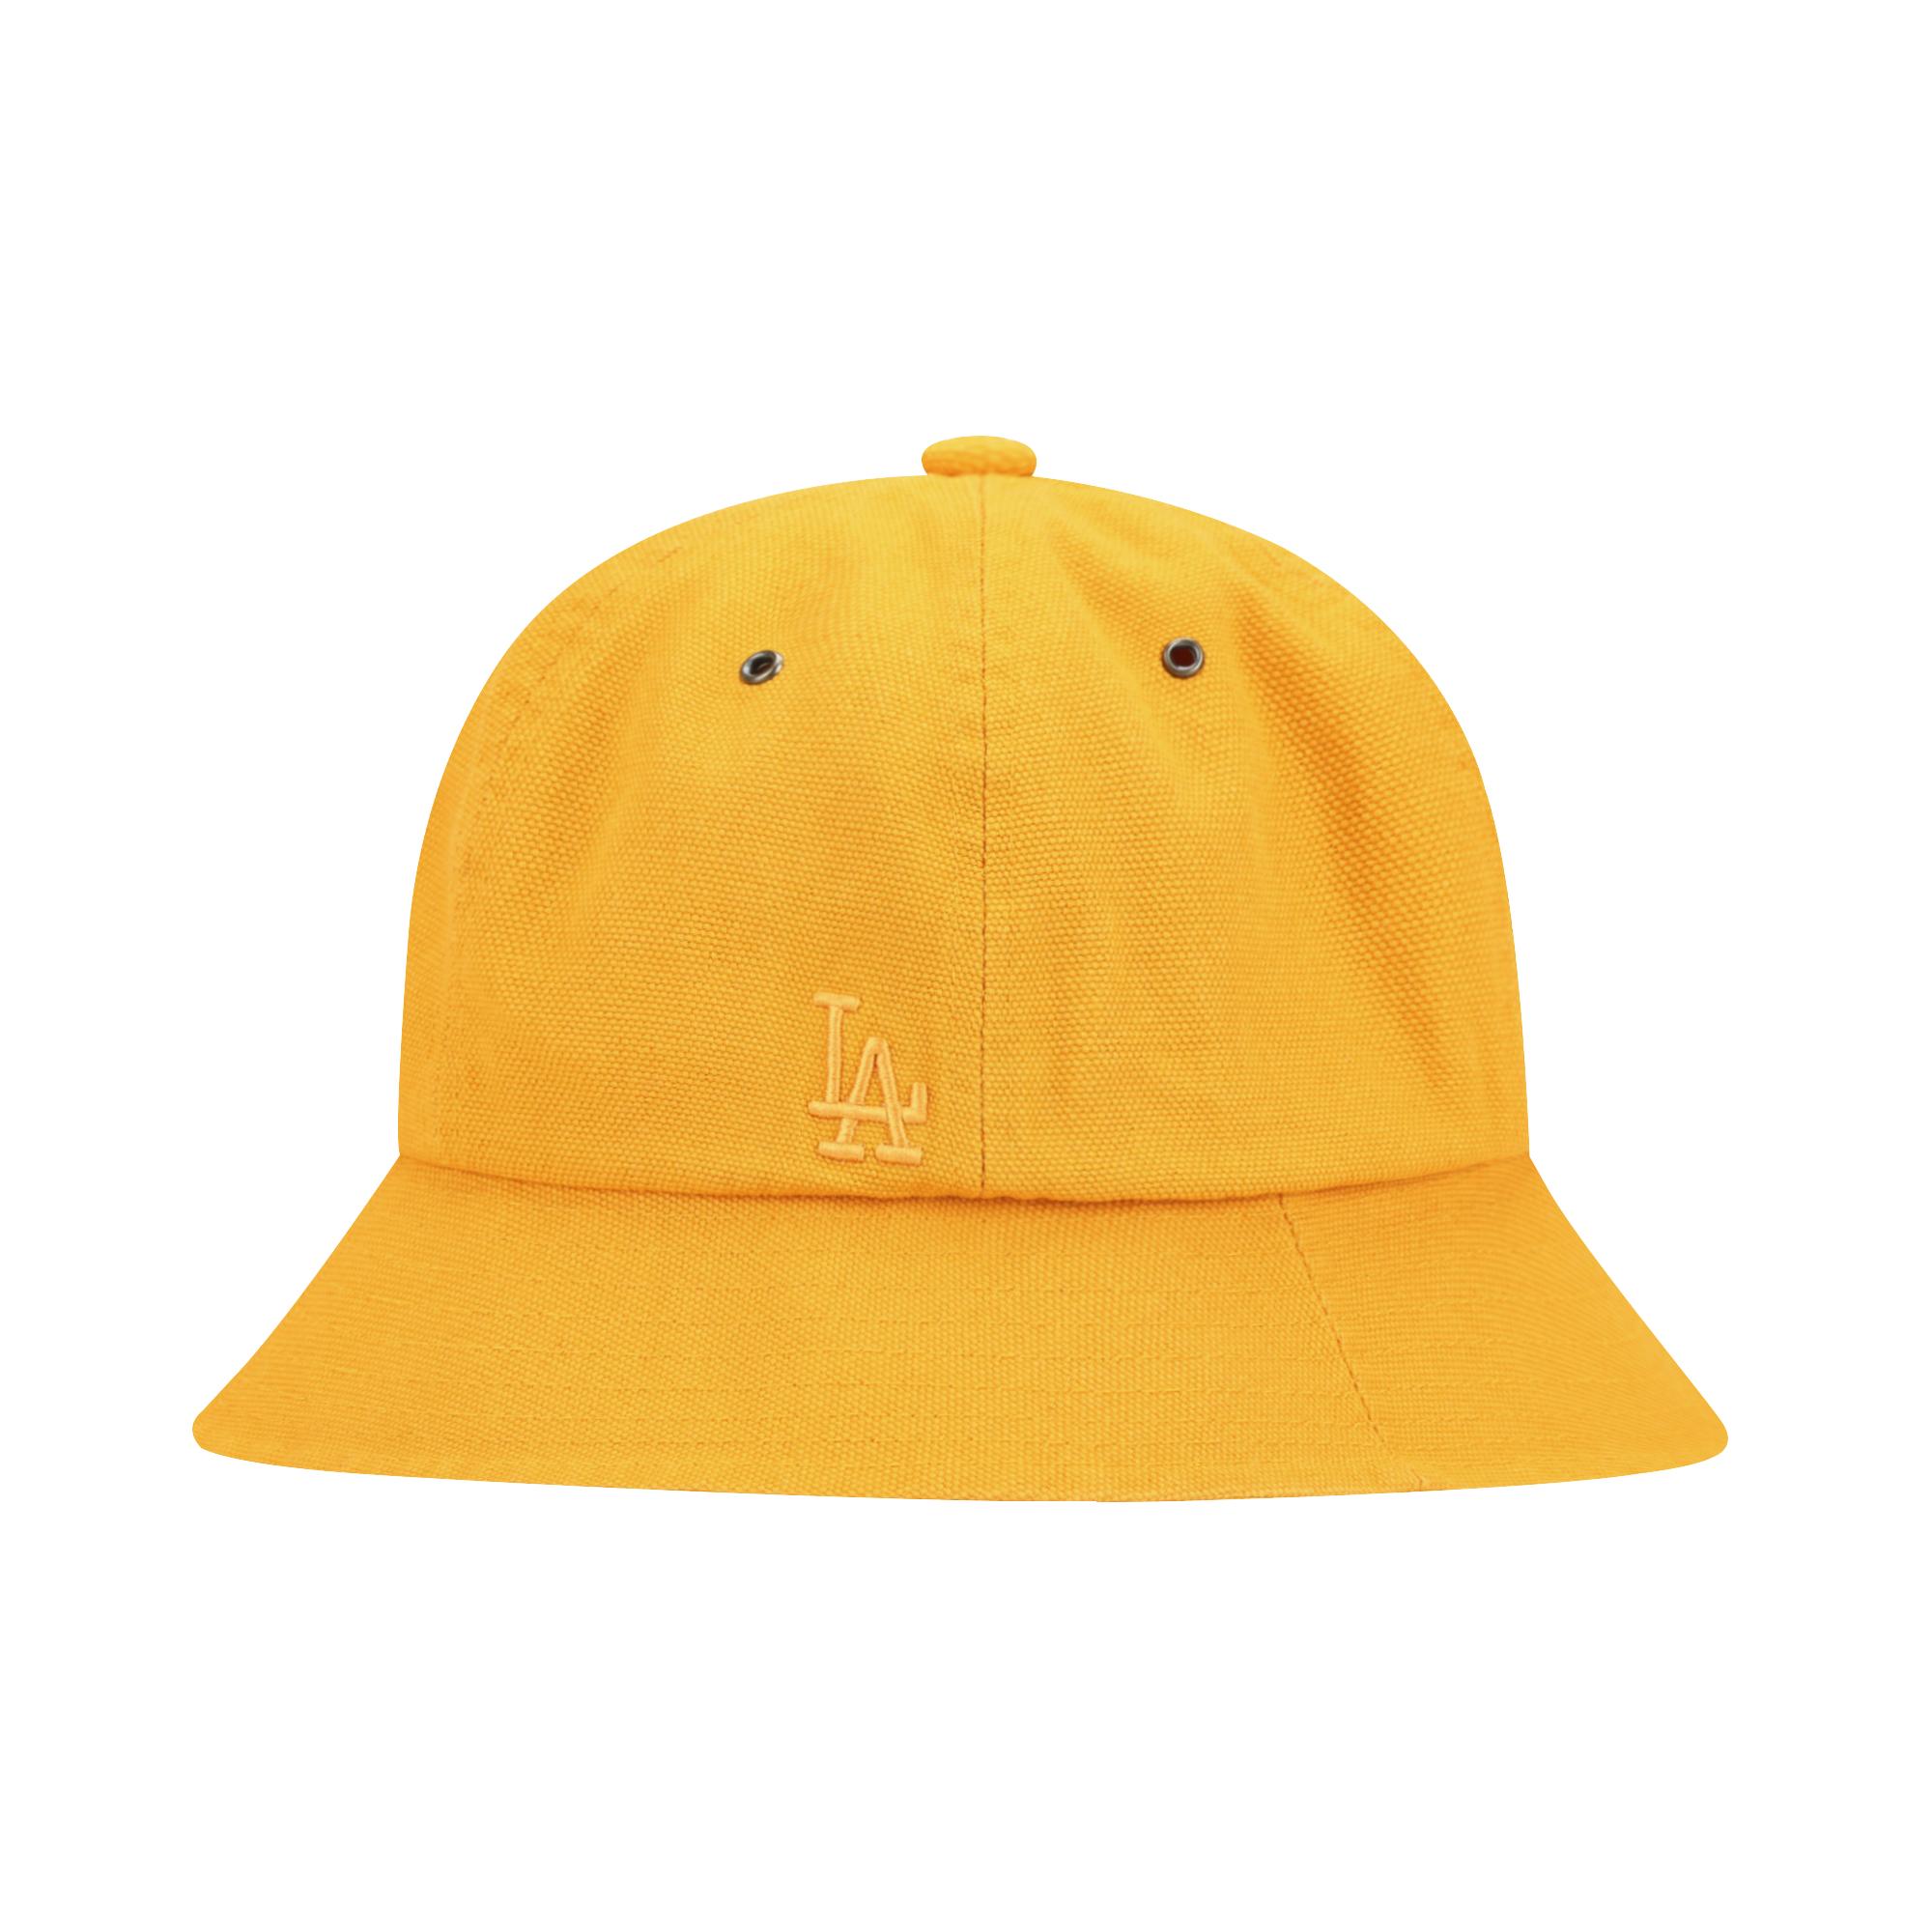 LA DODGERS OXFORD DOME HAT